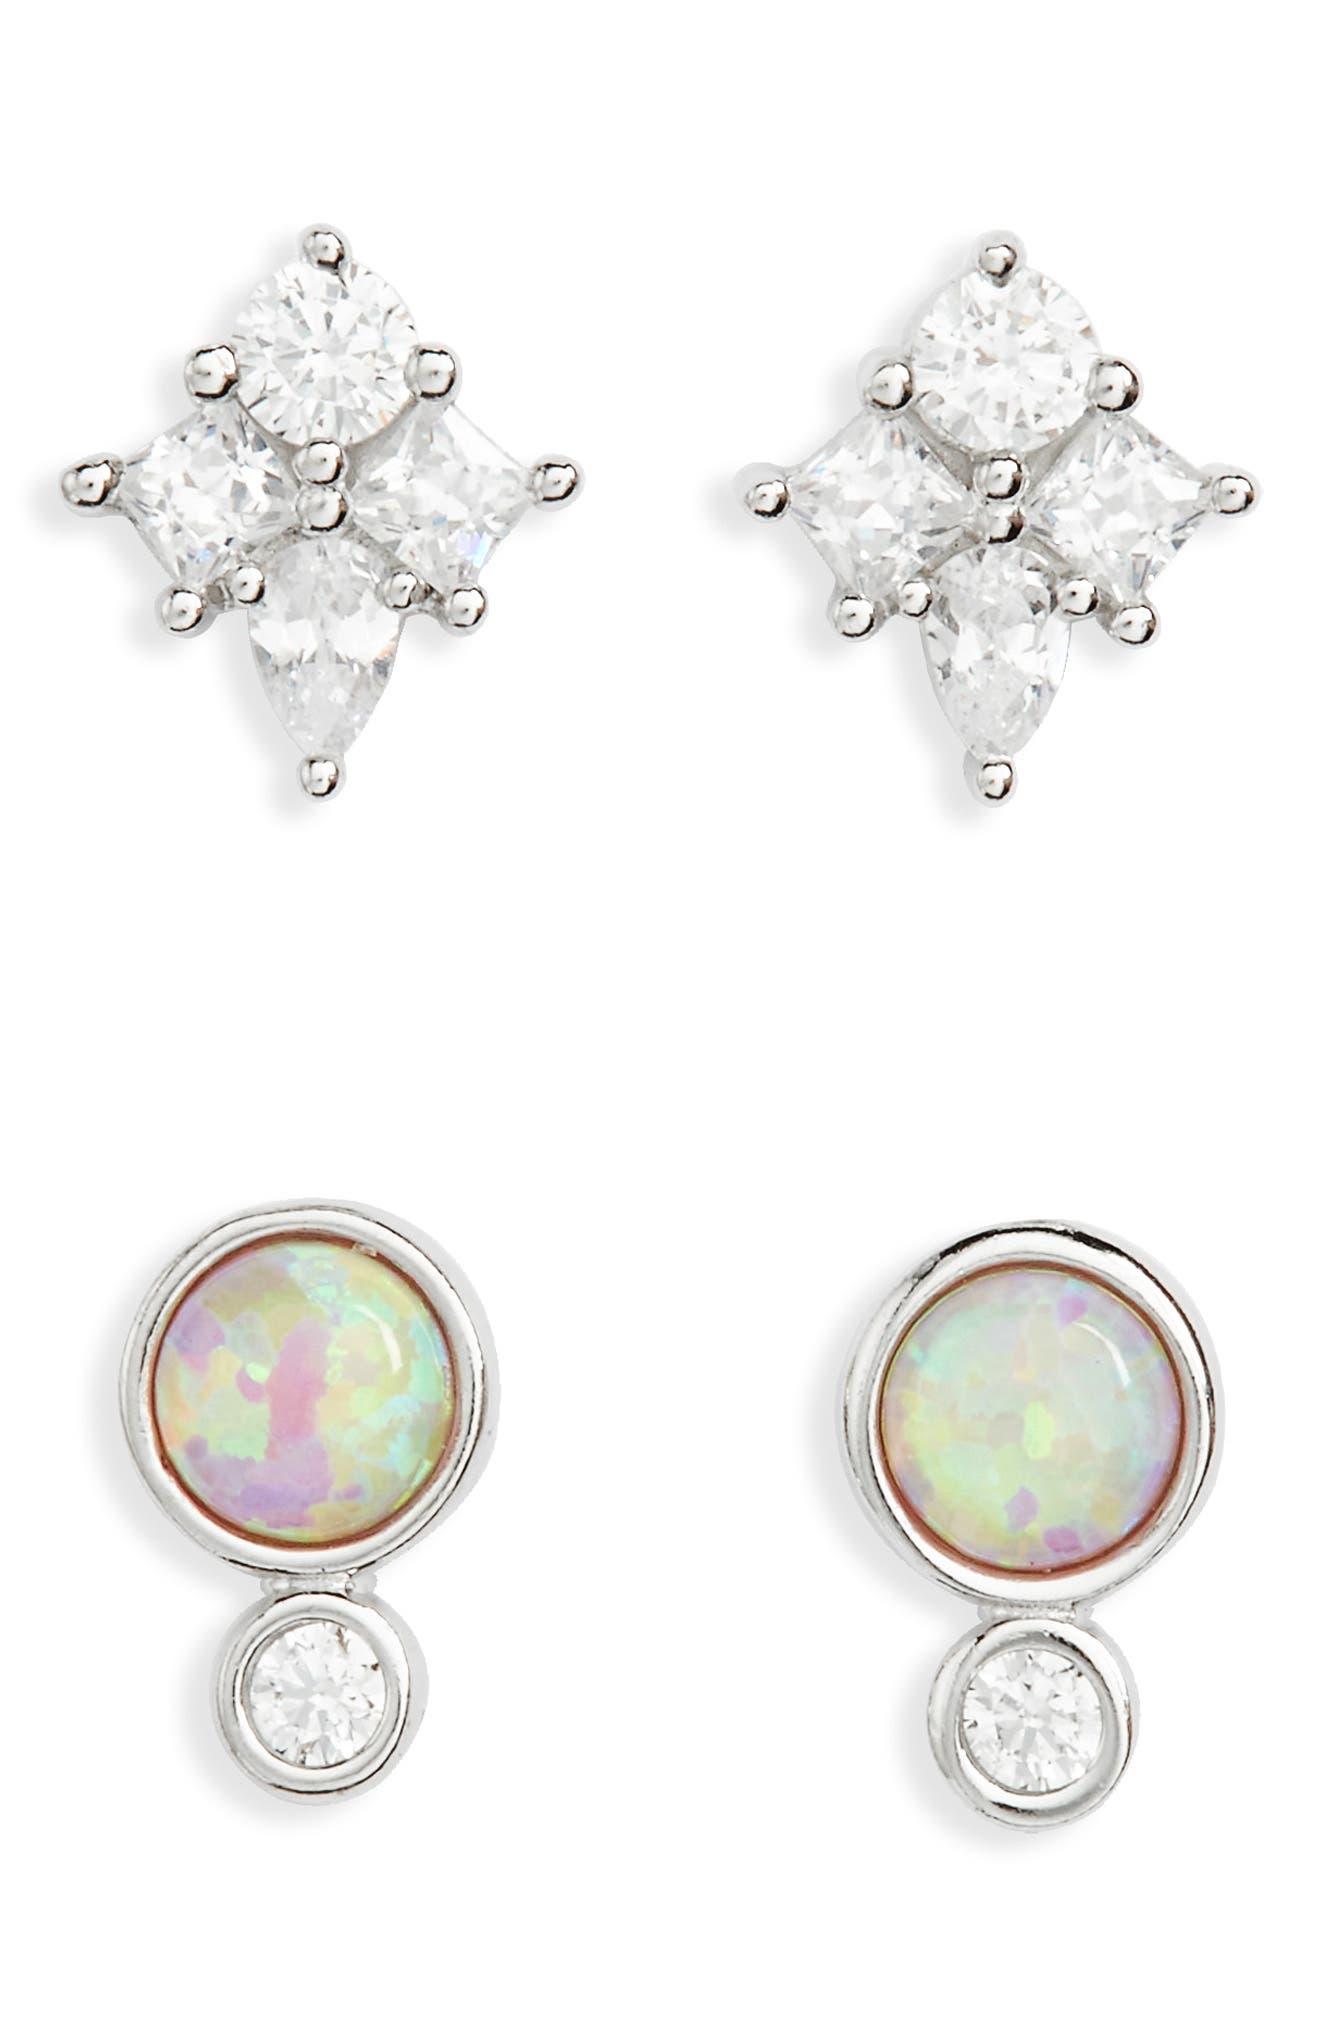 Set of 2 Opal & Cubic Zirconia Stud Earrings,                             Main thumbnail 1, color,                             040